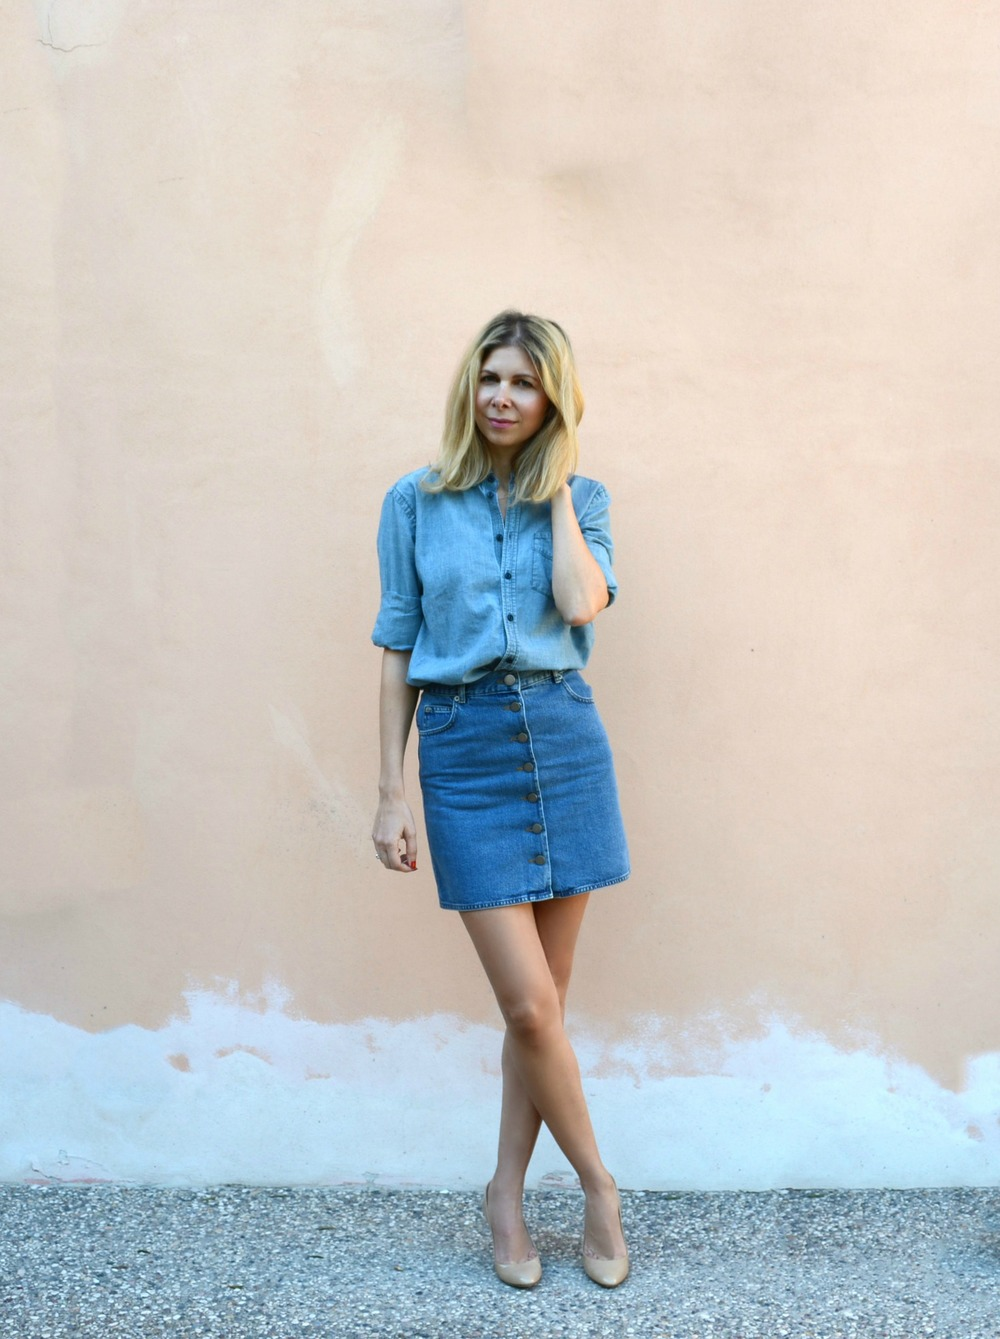 ASOS Denim skirt, Madewell shirt, Jimmy Choo shoes.